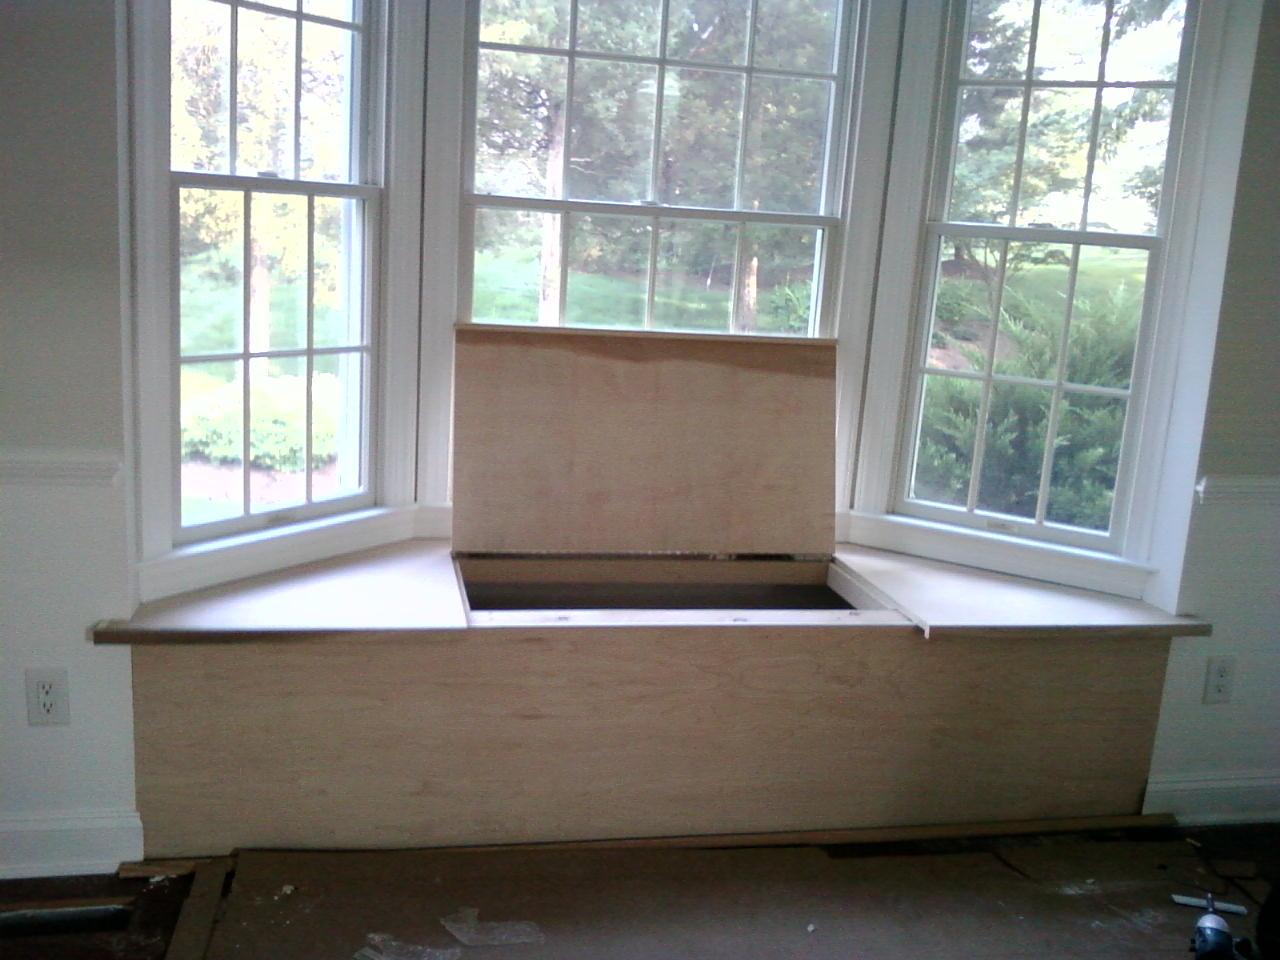 nj home improvement blog window seat. Black Bedroom Furniture Sets. Home Design Ideas